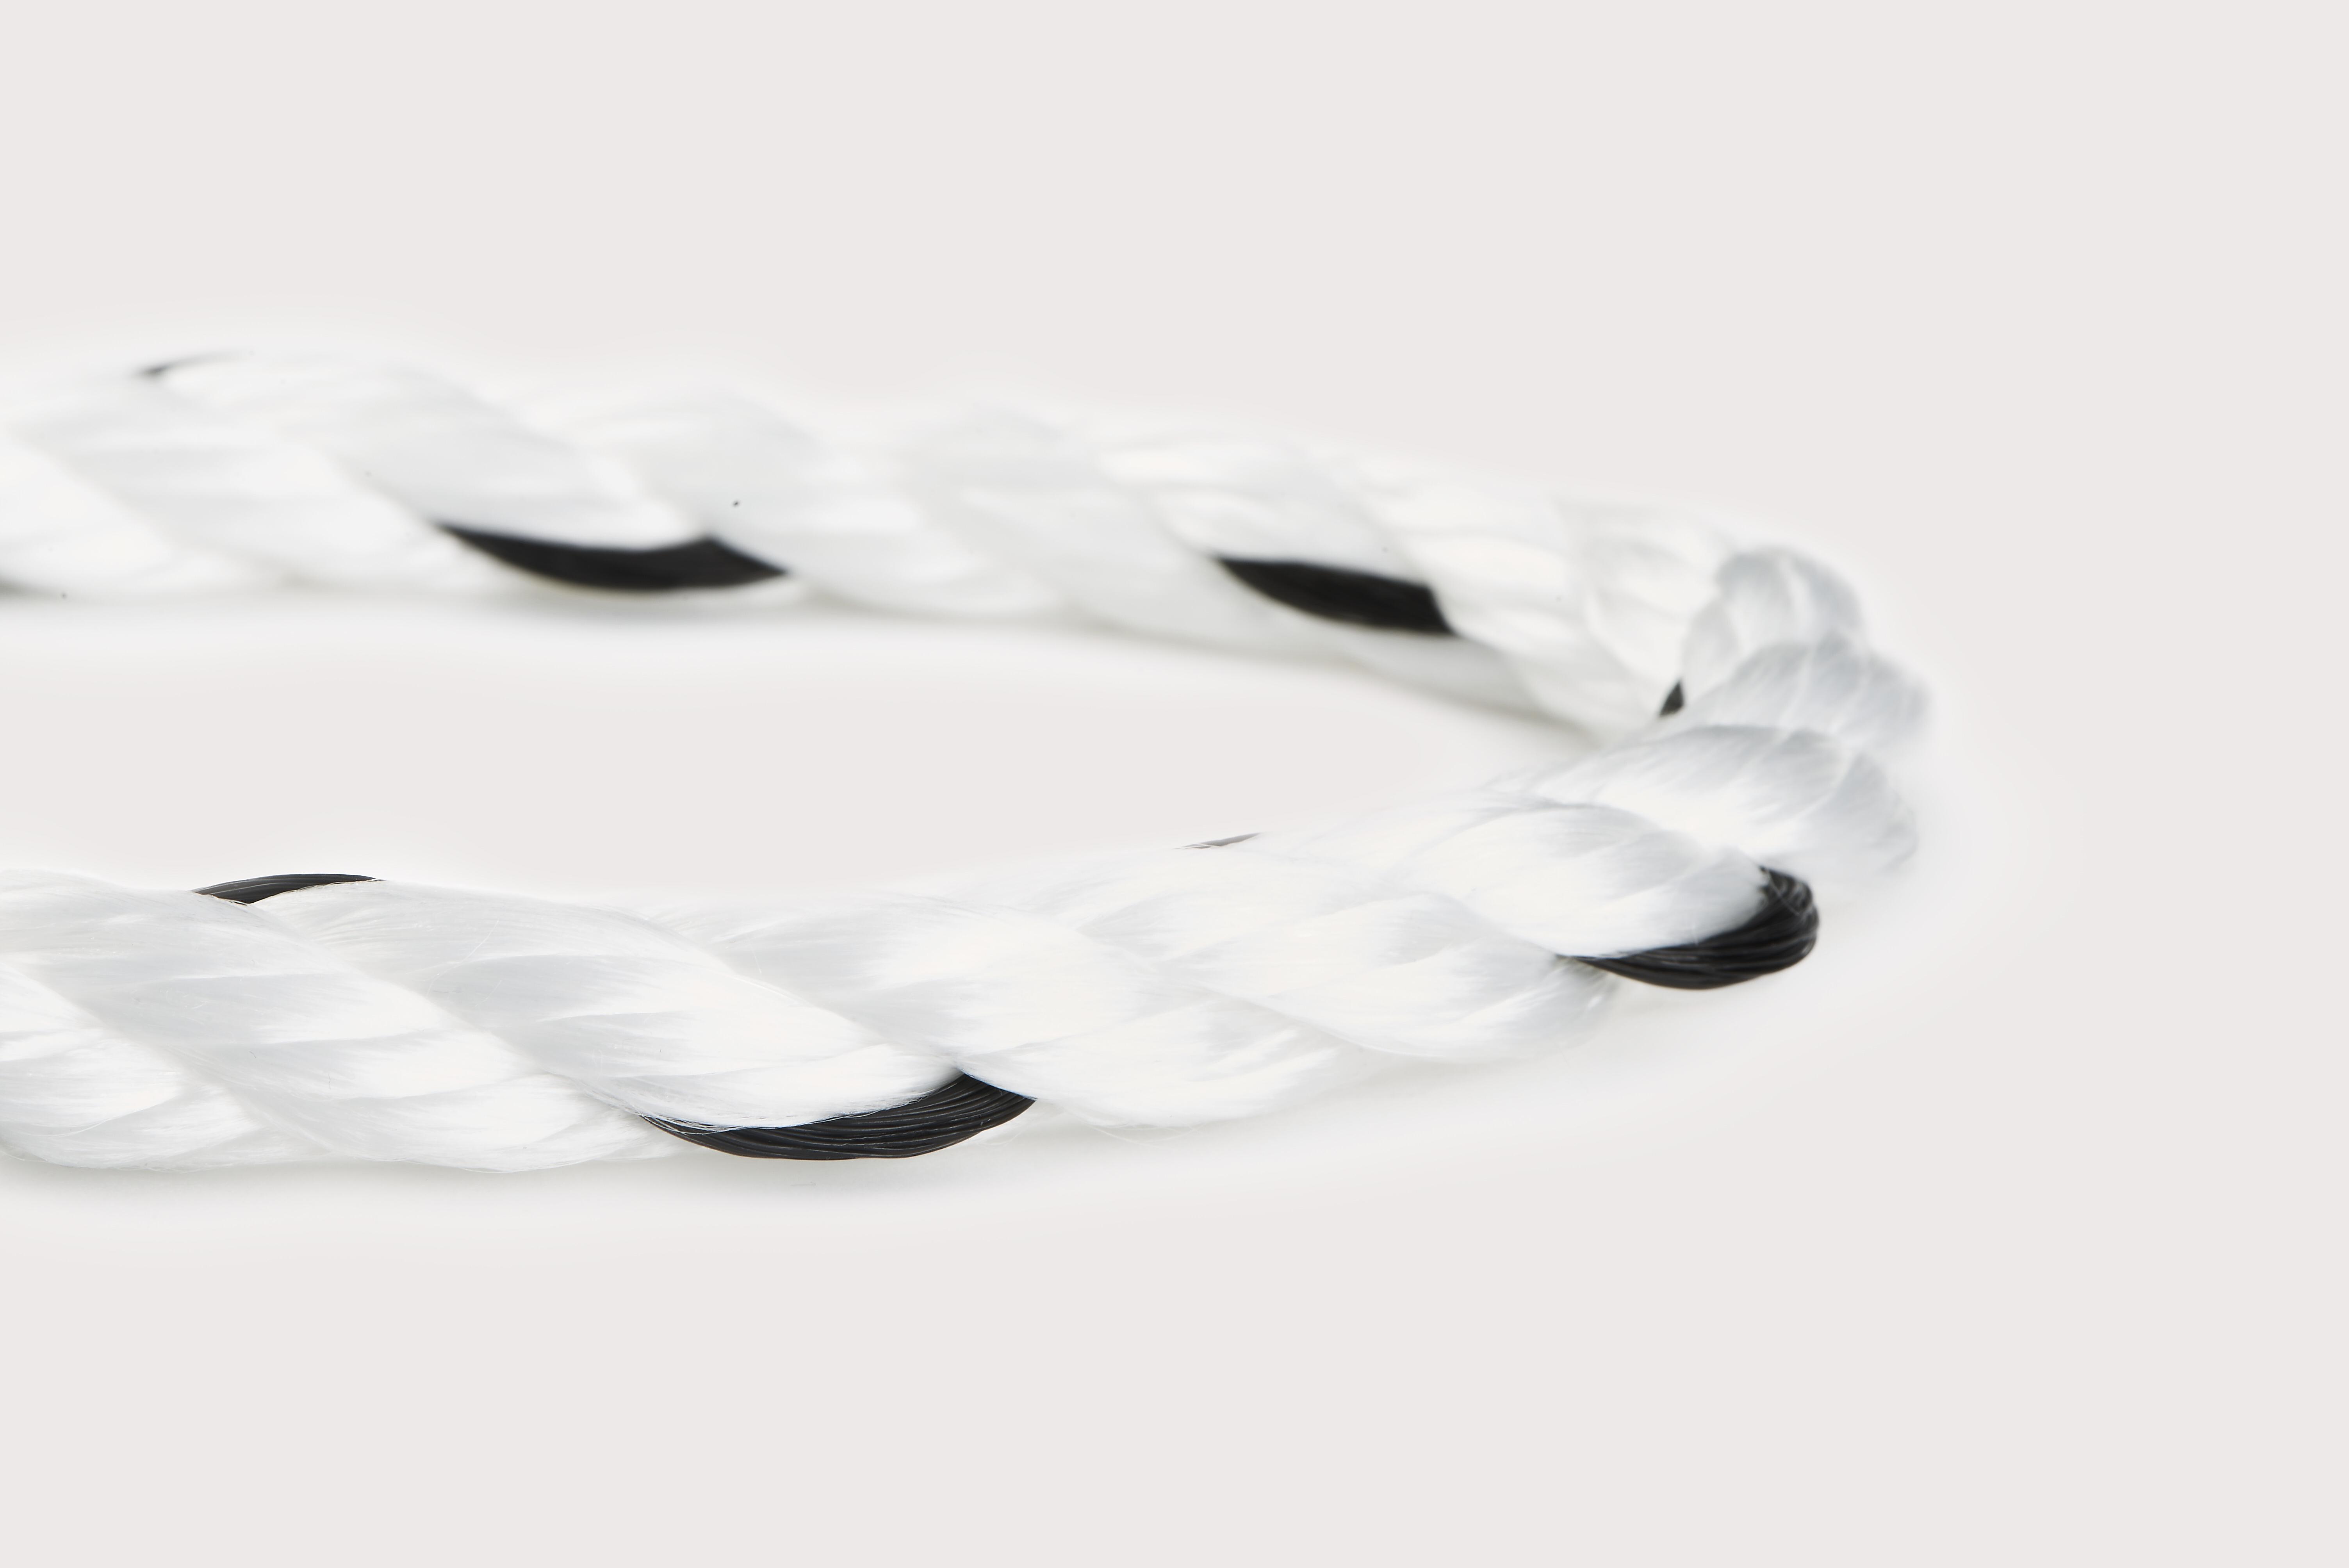 Orion-Cordage-Prodac 3-Strand Combination-White I Black -Curved188.jpg